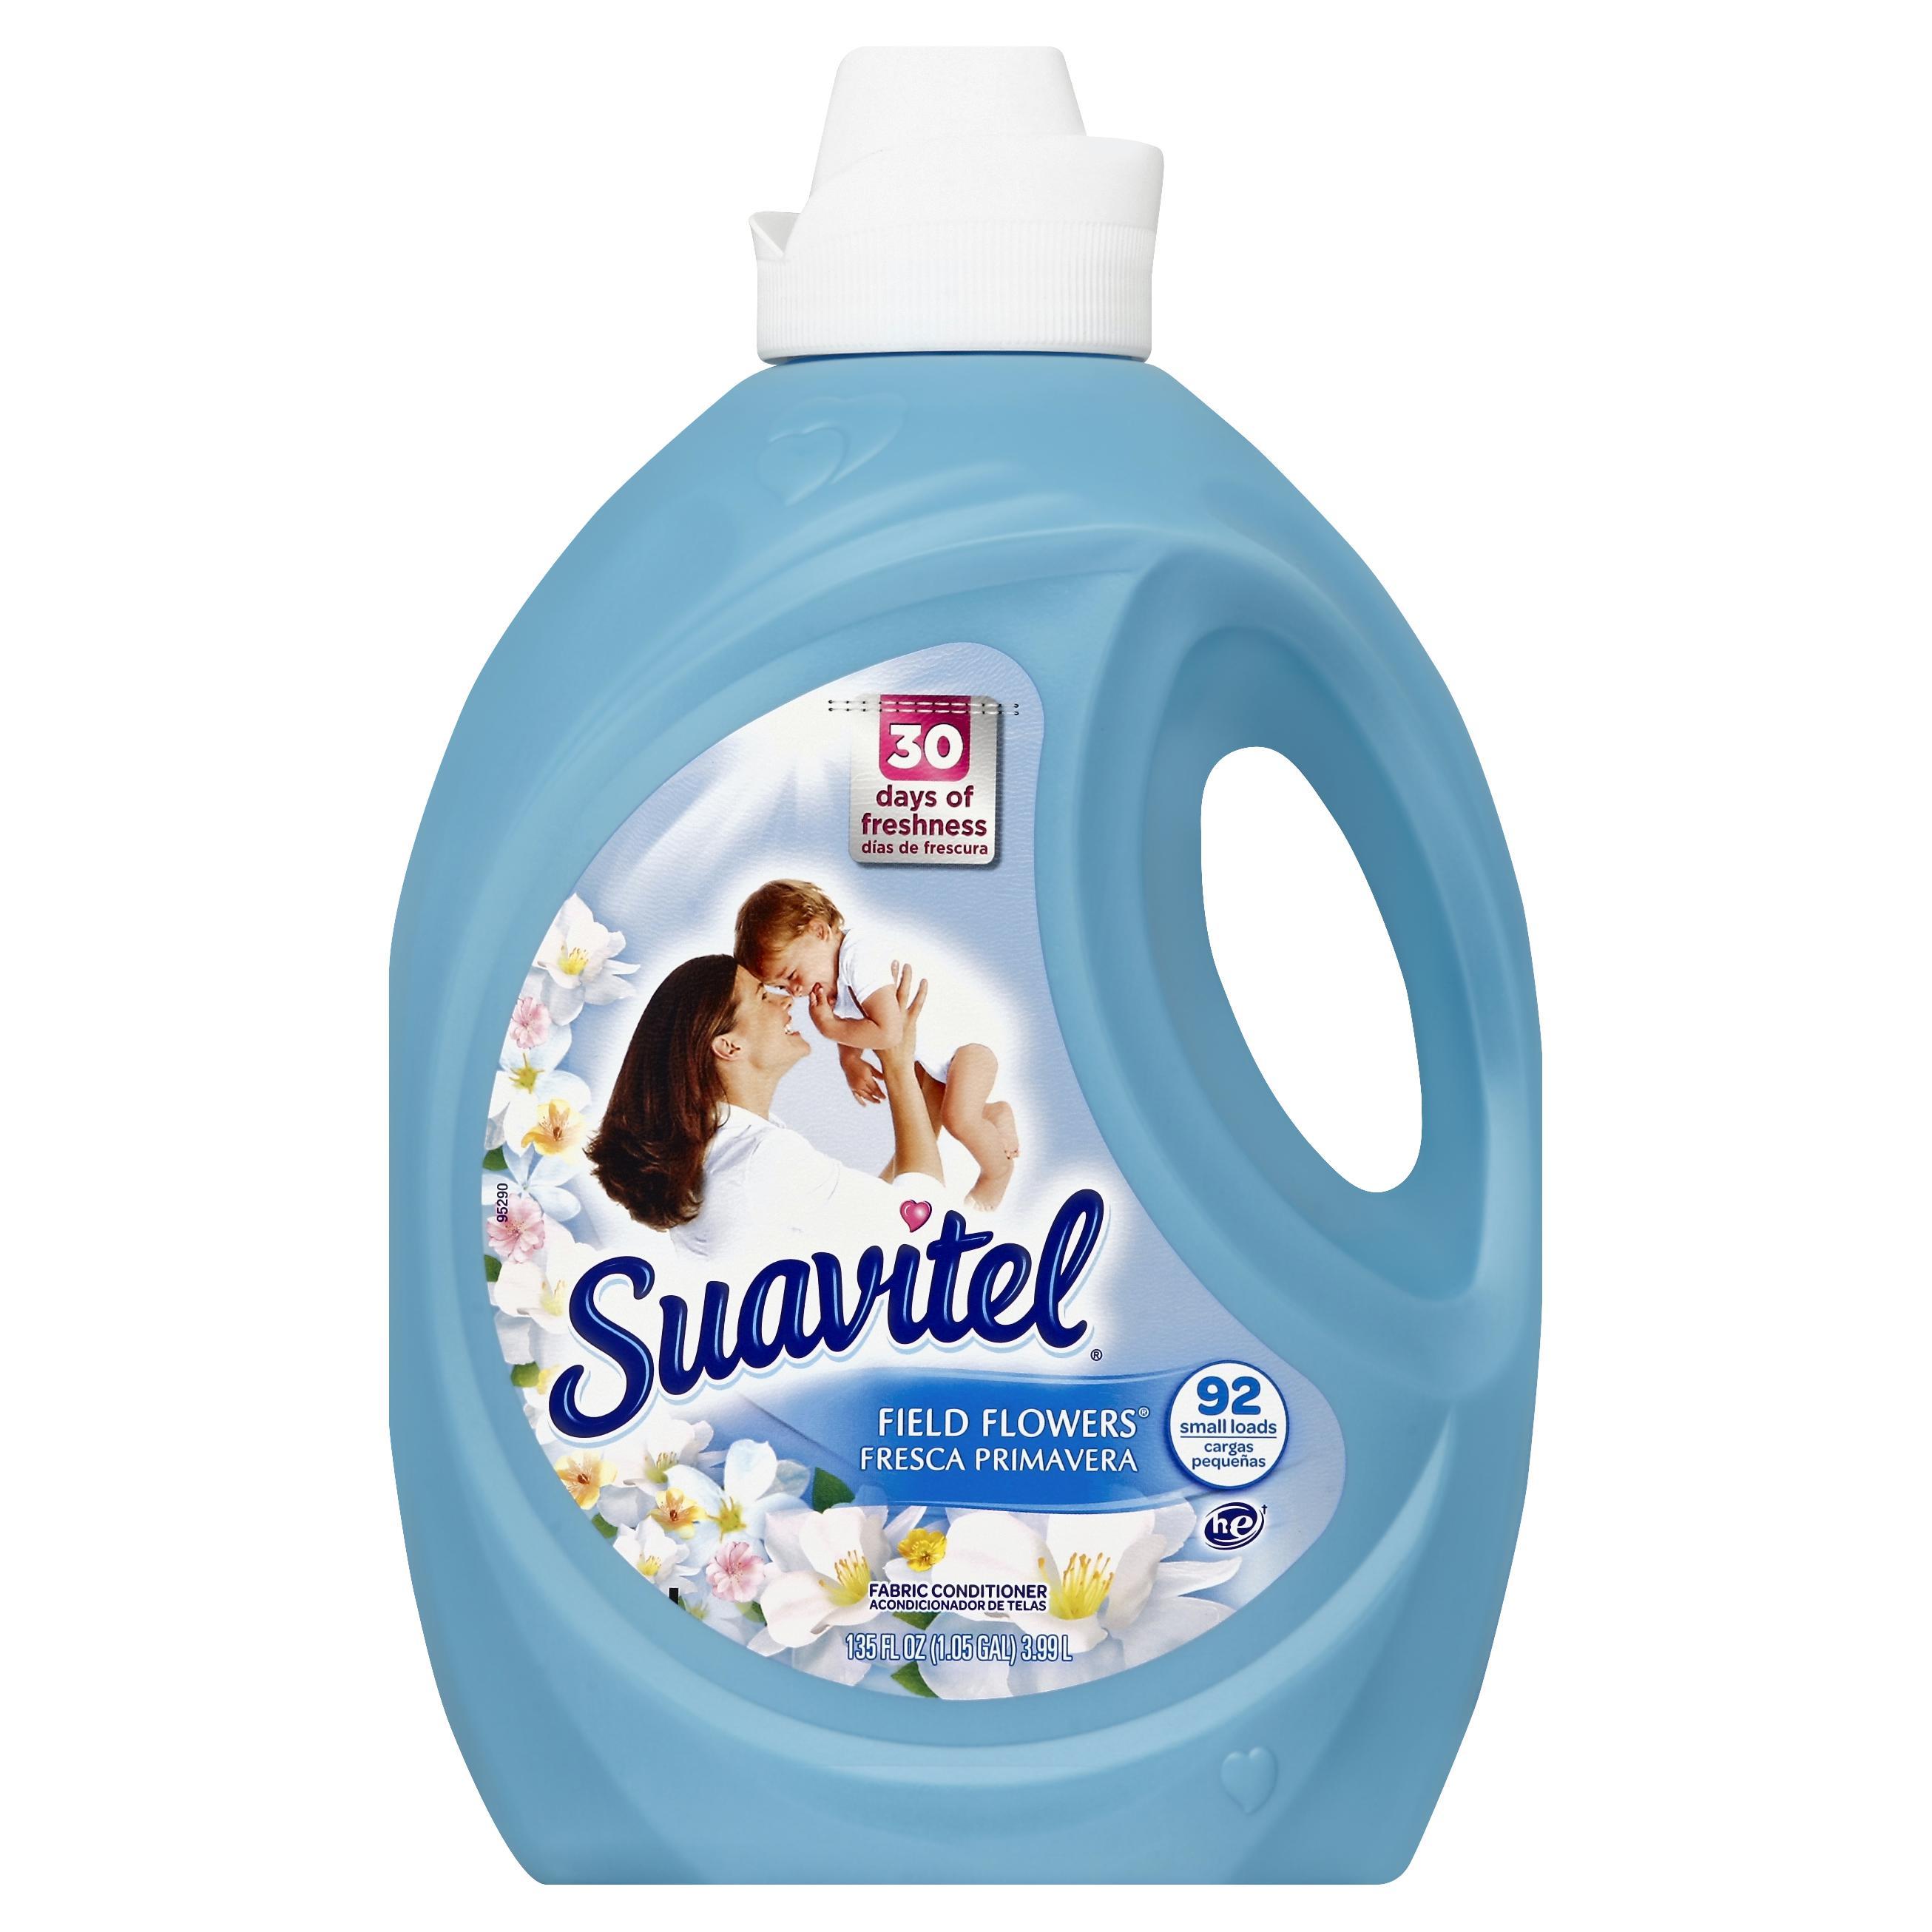 Suavitel Fabric Conditioner Field Flowers 135 fl oz (1.05 gl) 3.99 lt im test